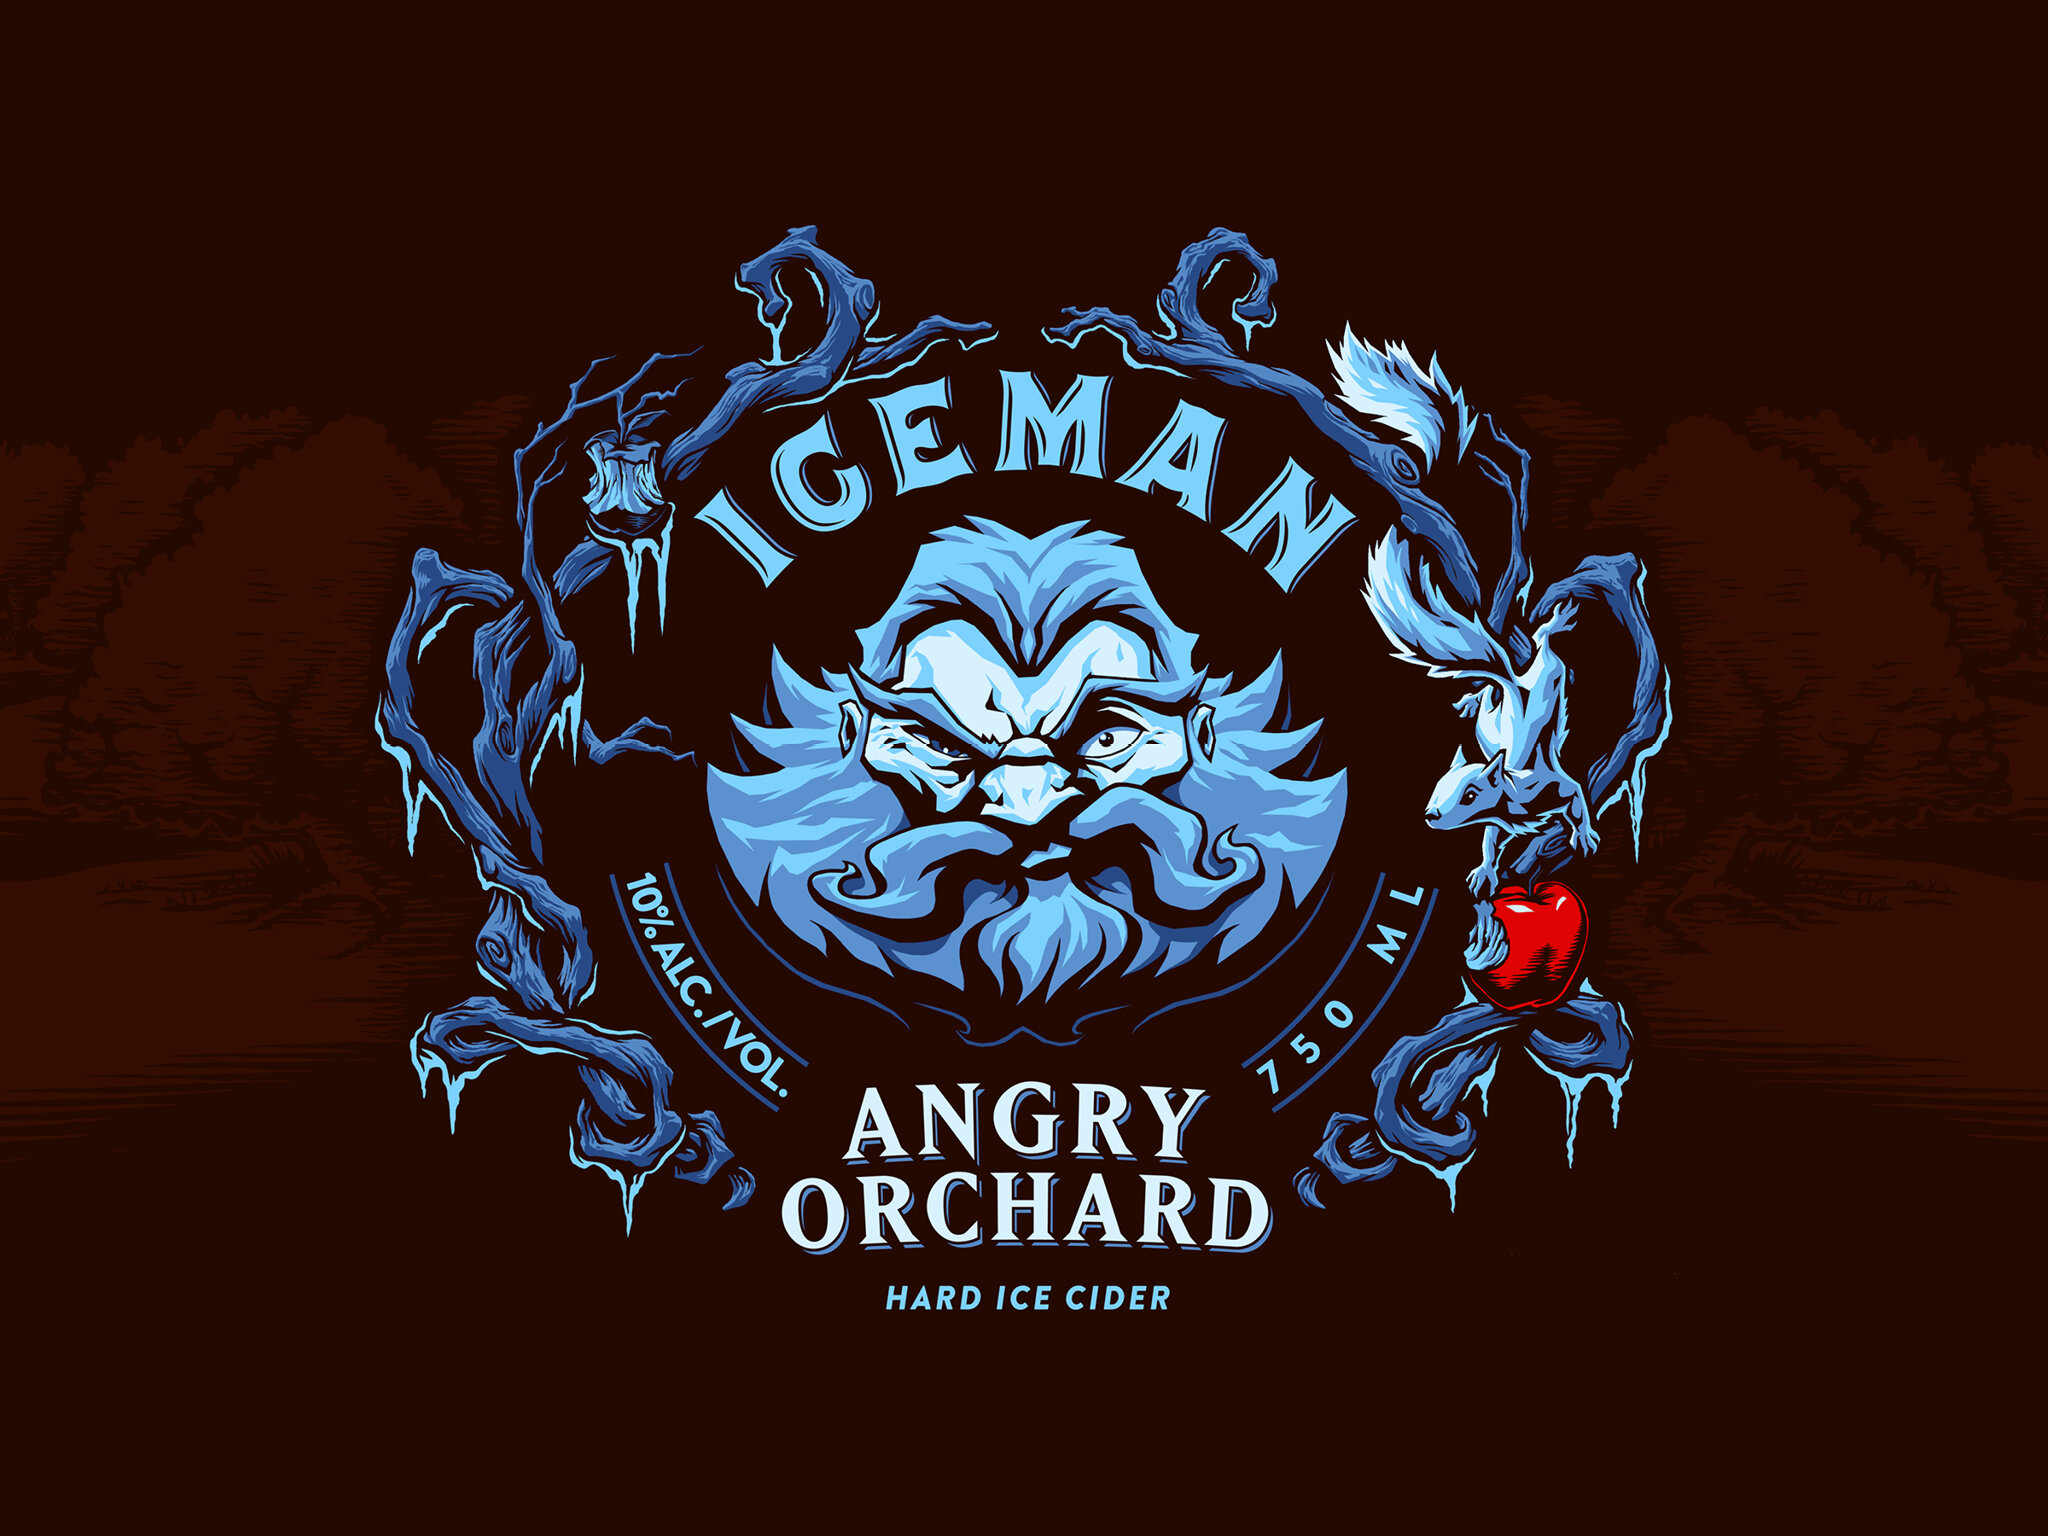 PLT_MF_Angry_Orchard7.jpg